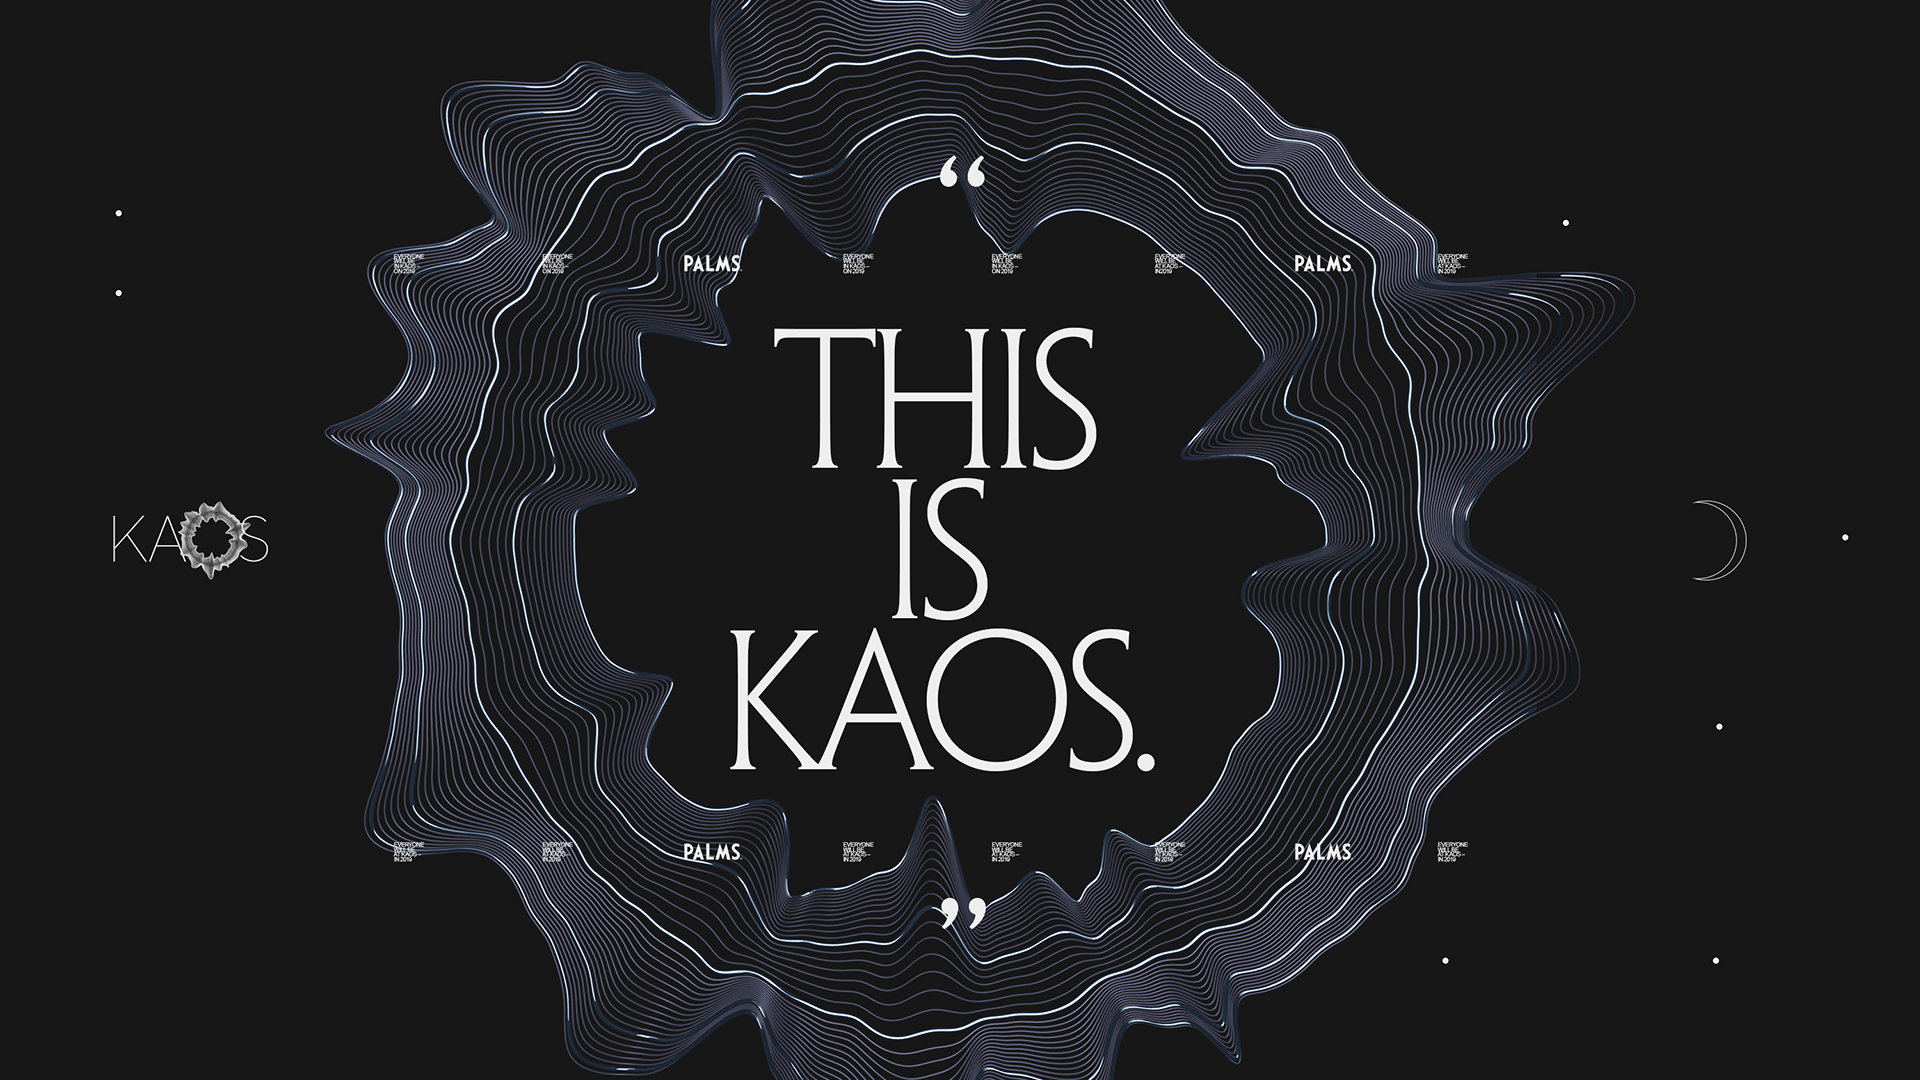 KAOS_2_THIS_IS.jpg